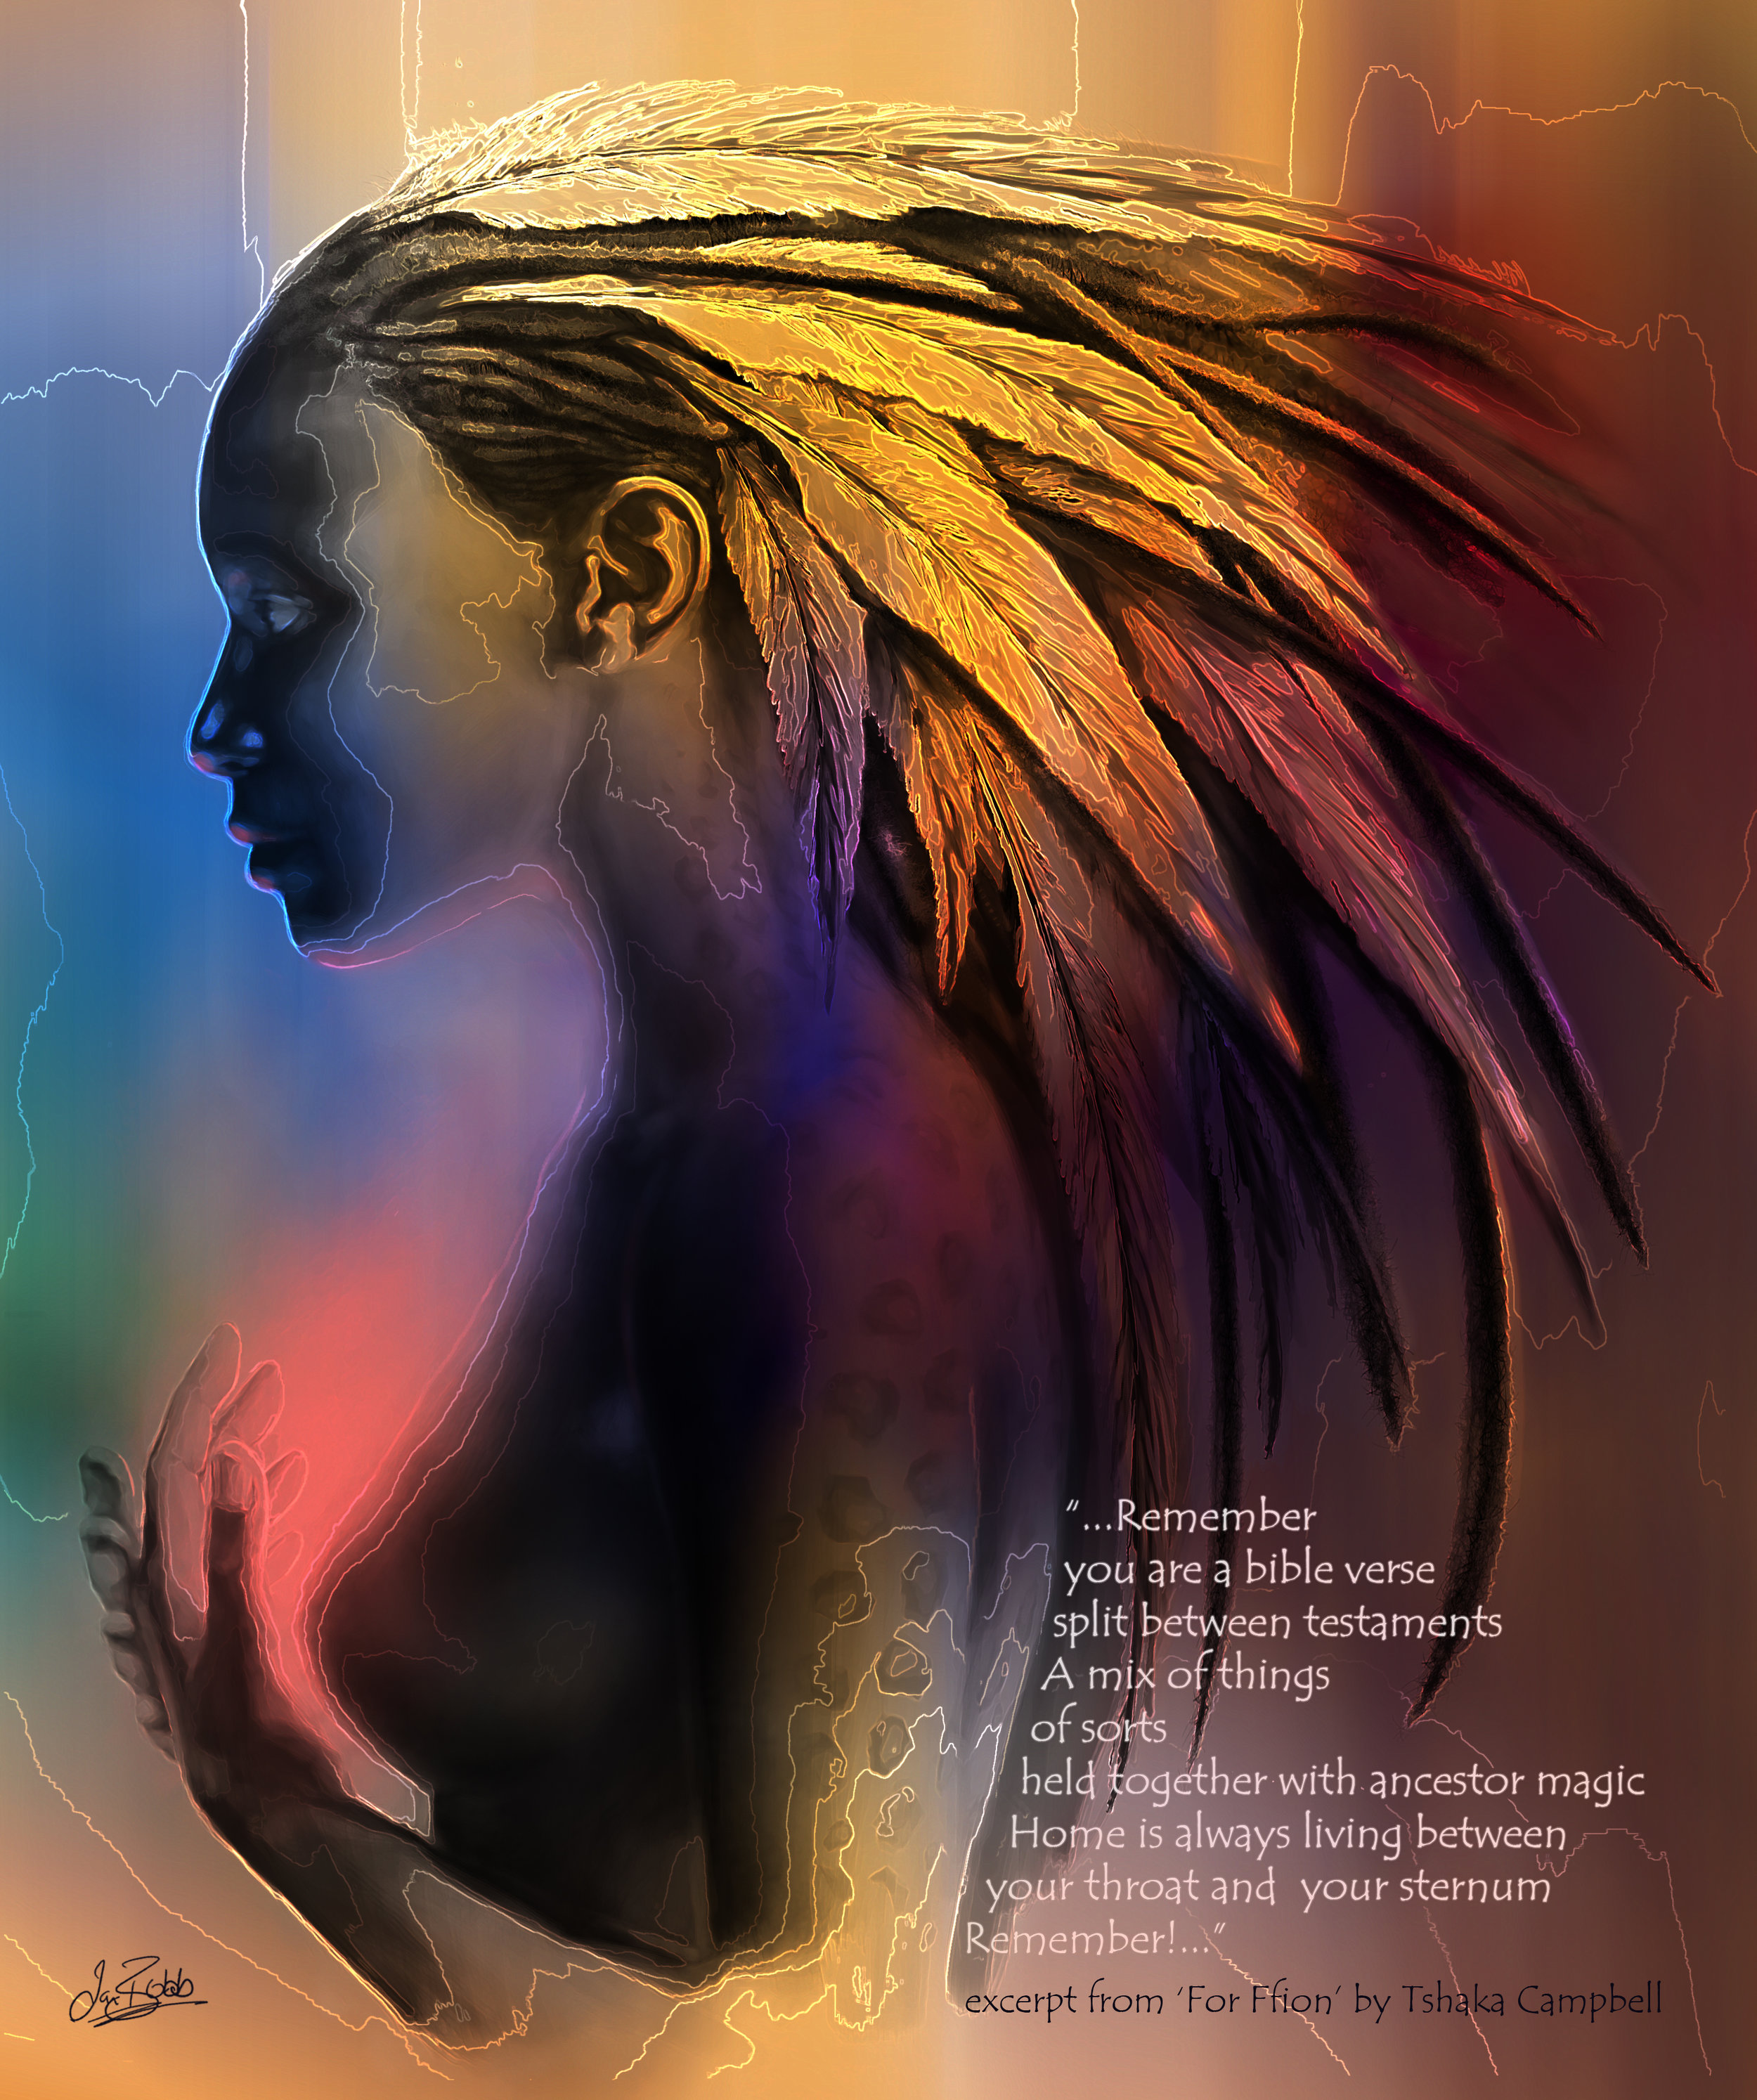 Artist: Ian Bobb  Poet: Tshaka Campbell